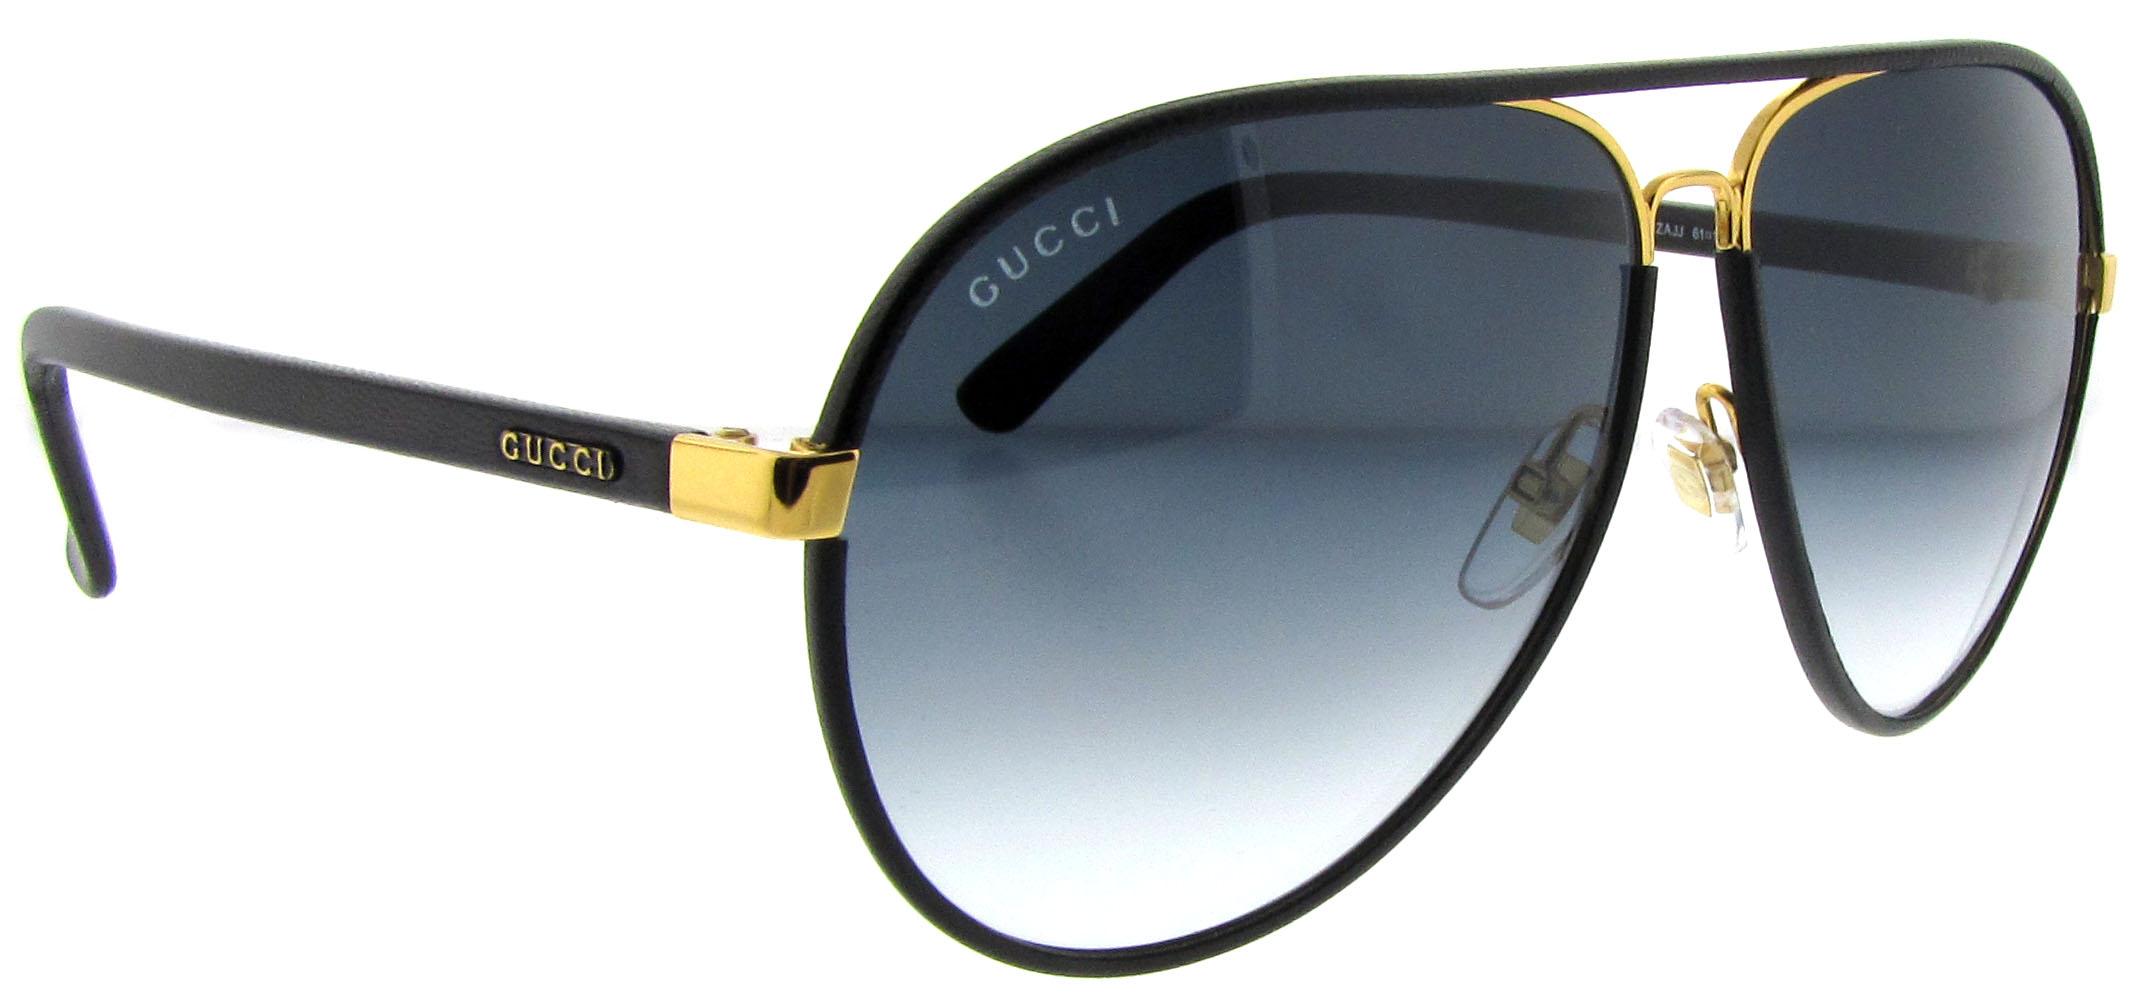 Gucci Sunglasses Leather Frame Aviator : Gucci GG 2887/S UZA Black Leather Unisex Aviator ...